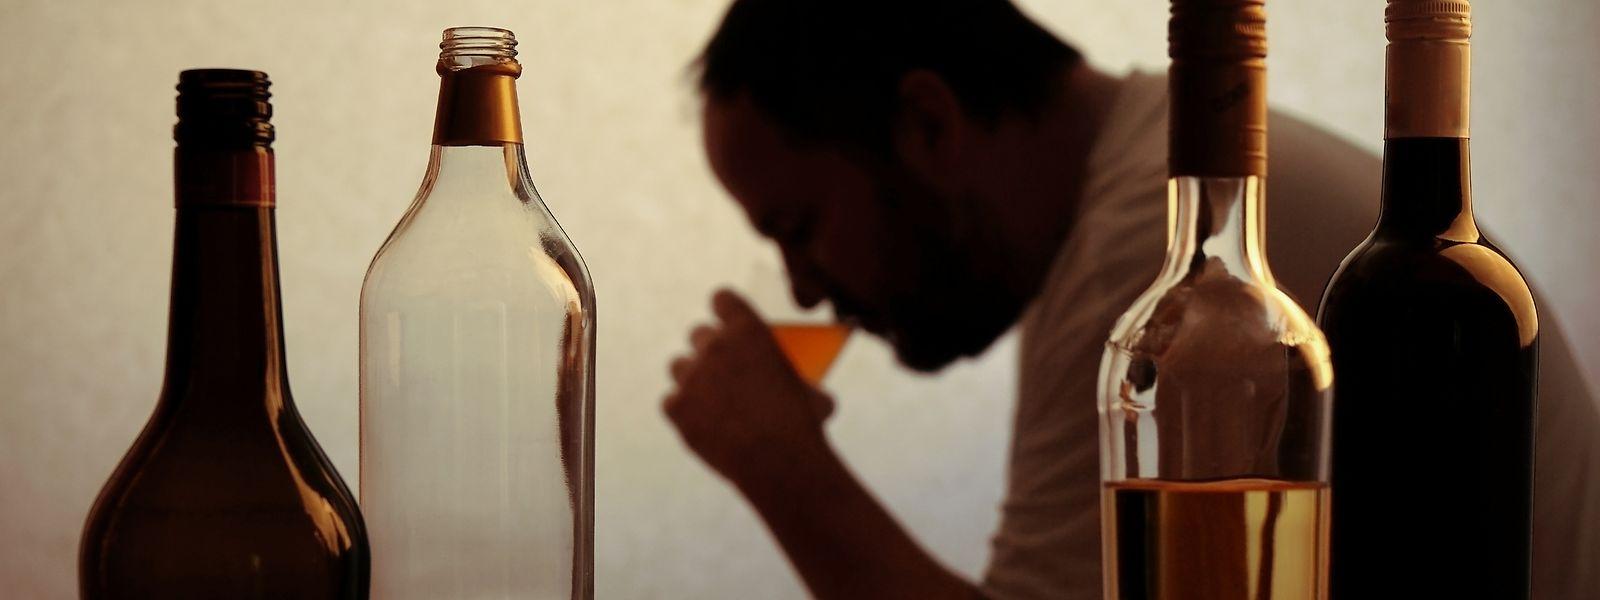 35% des adultes luxembourgeois ont une consommation d'alcool excessive, selon l'OCDE.